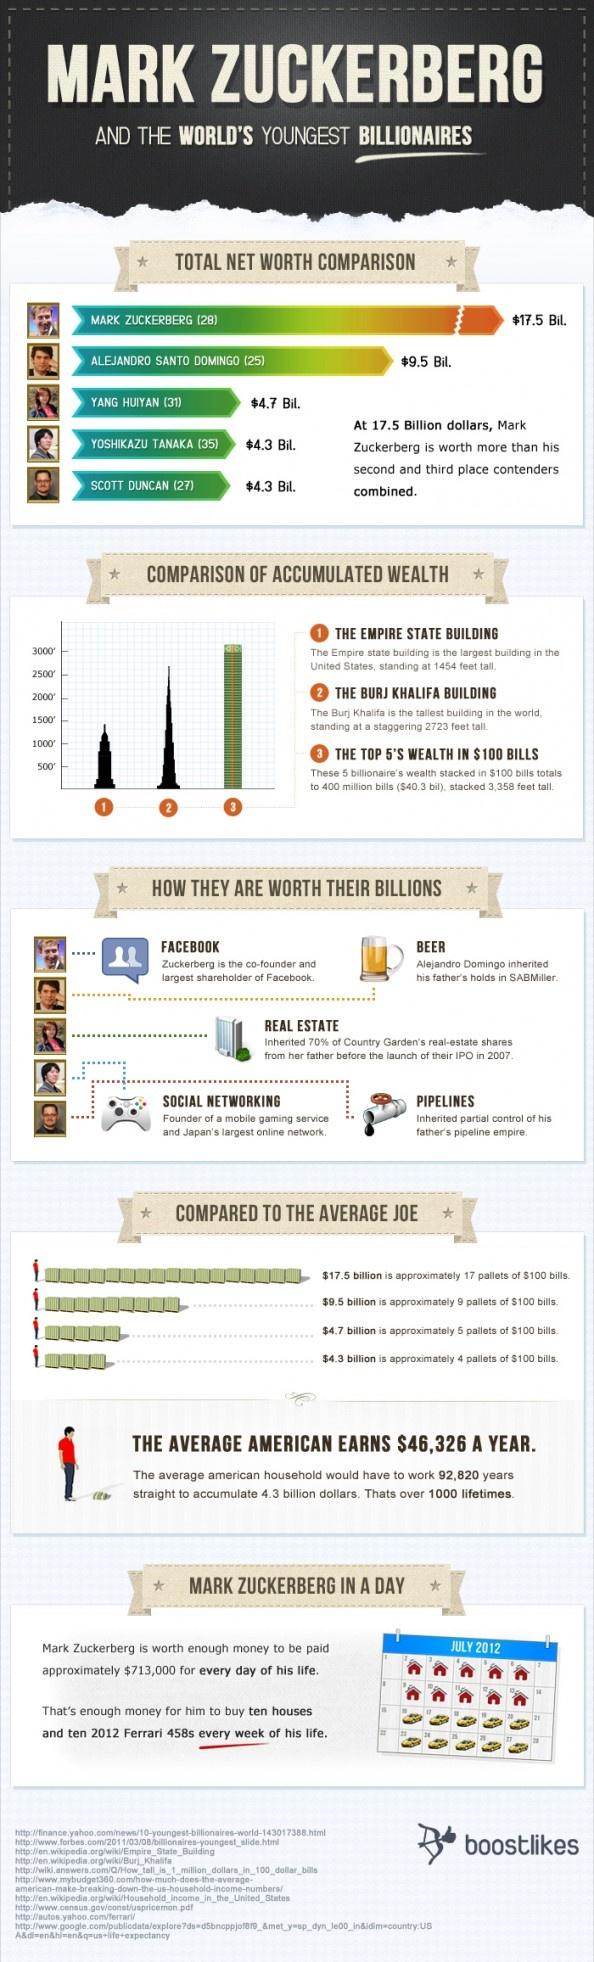 Mark Zuckerburg and The World's Youngest Billionaires Infographic